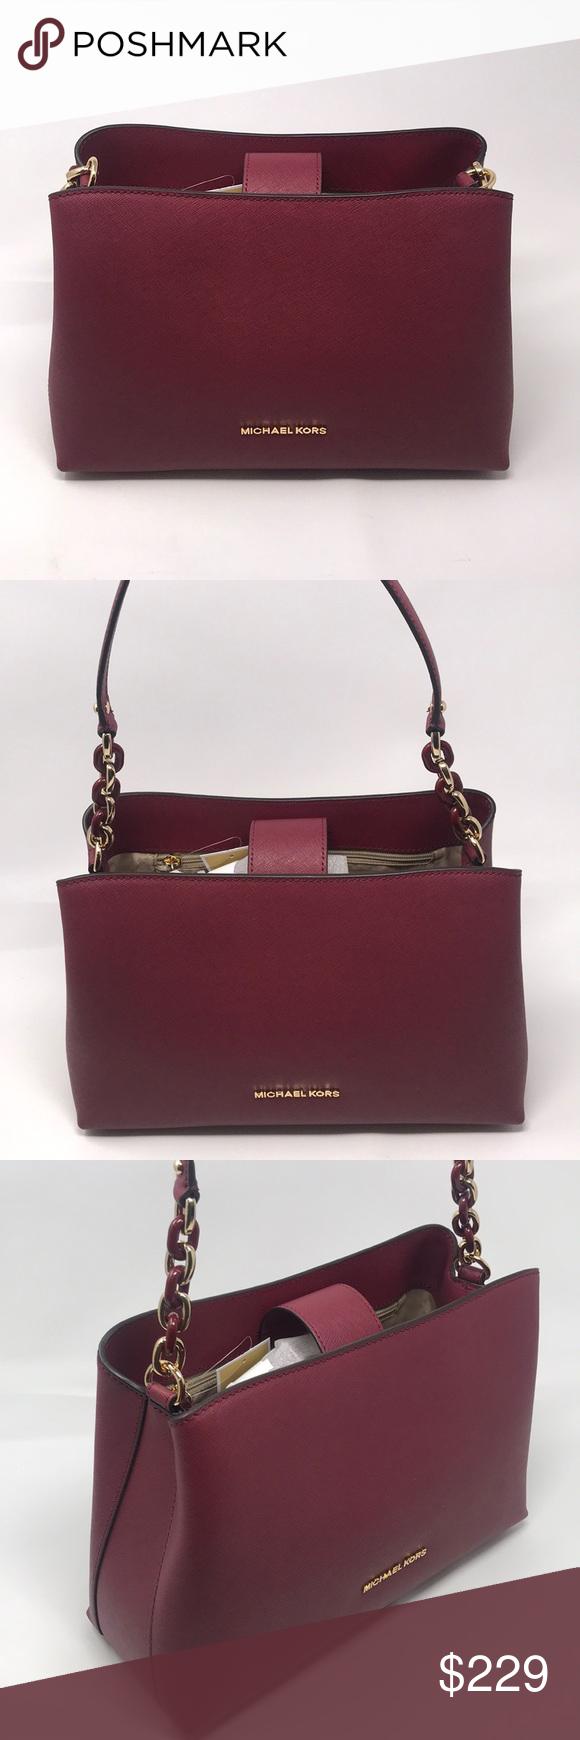 "2deefde577 Michael Kors Mulberry Bag Michael Kors Mulberry Bag 13"" x 9"" x 5"" Michael  Kors Bags"